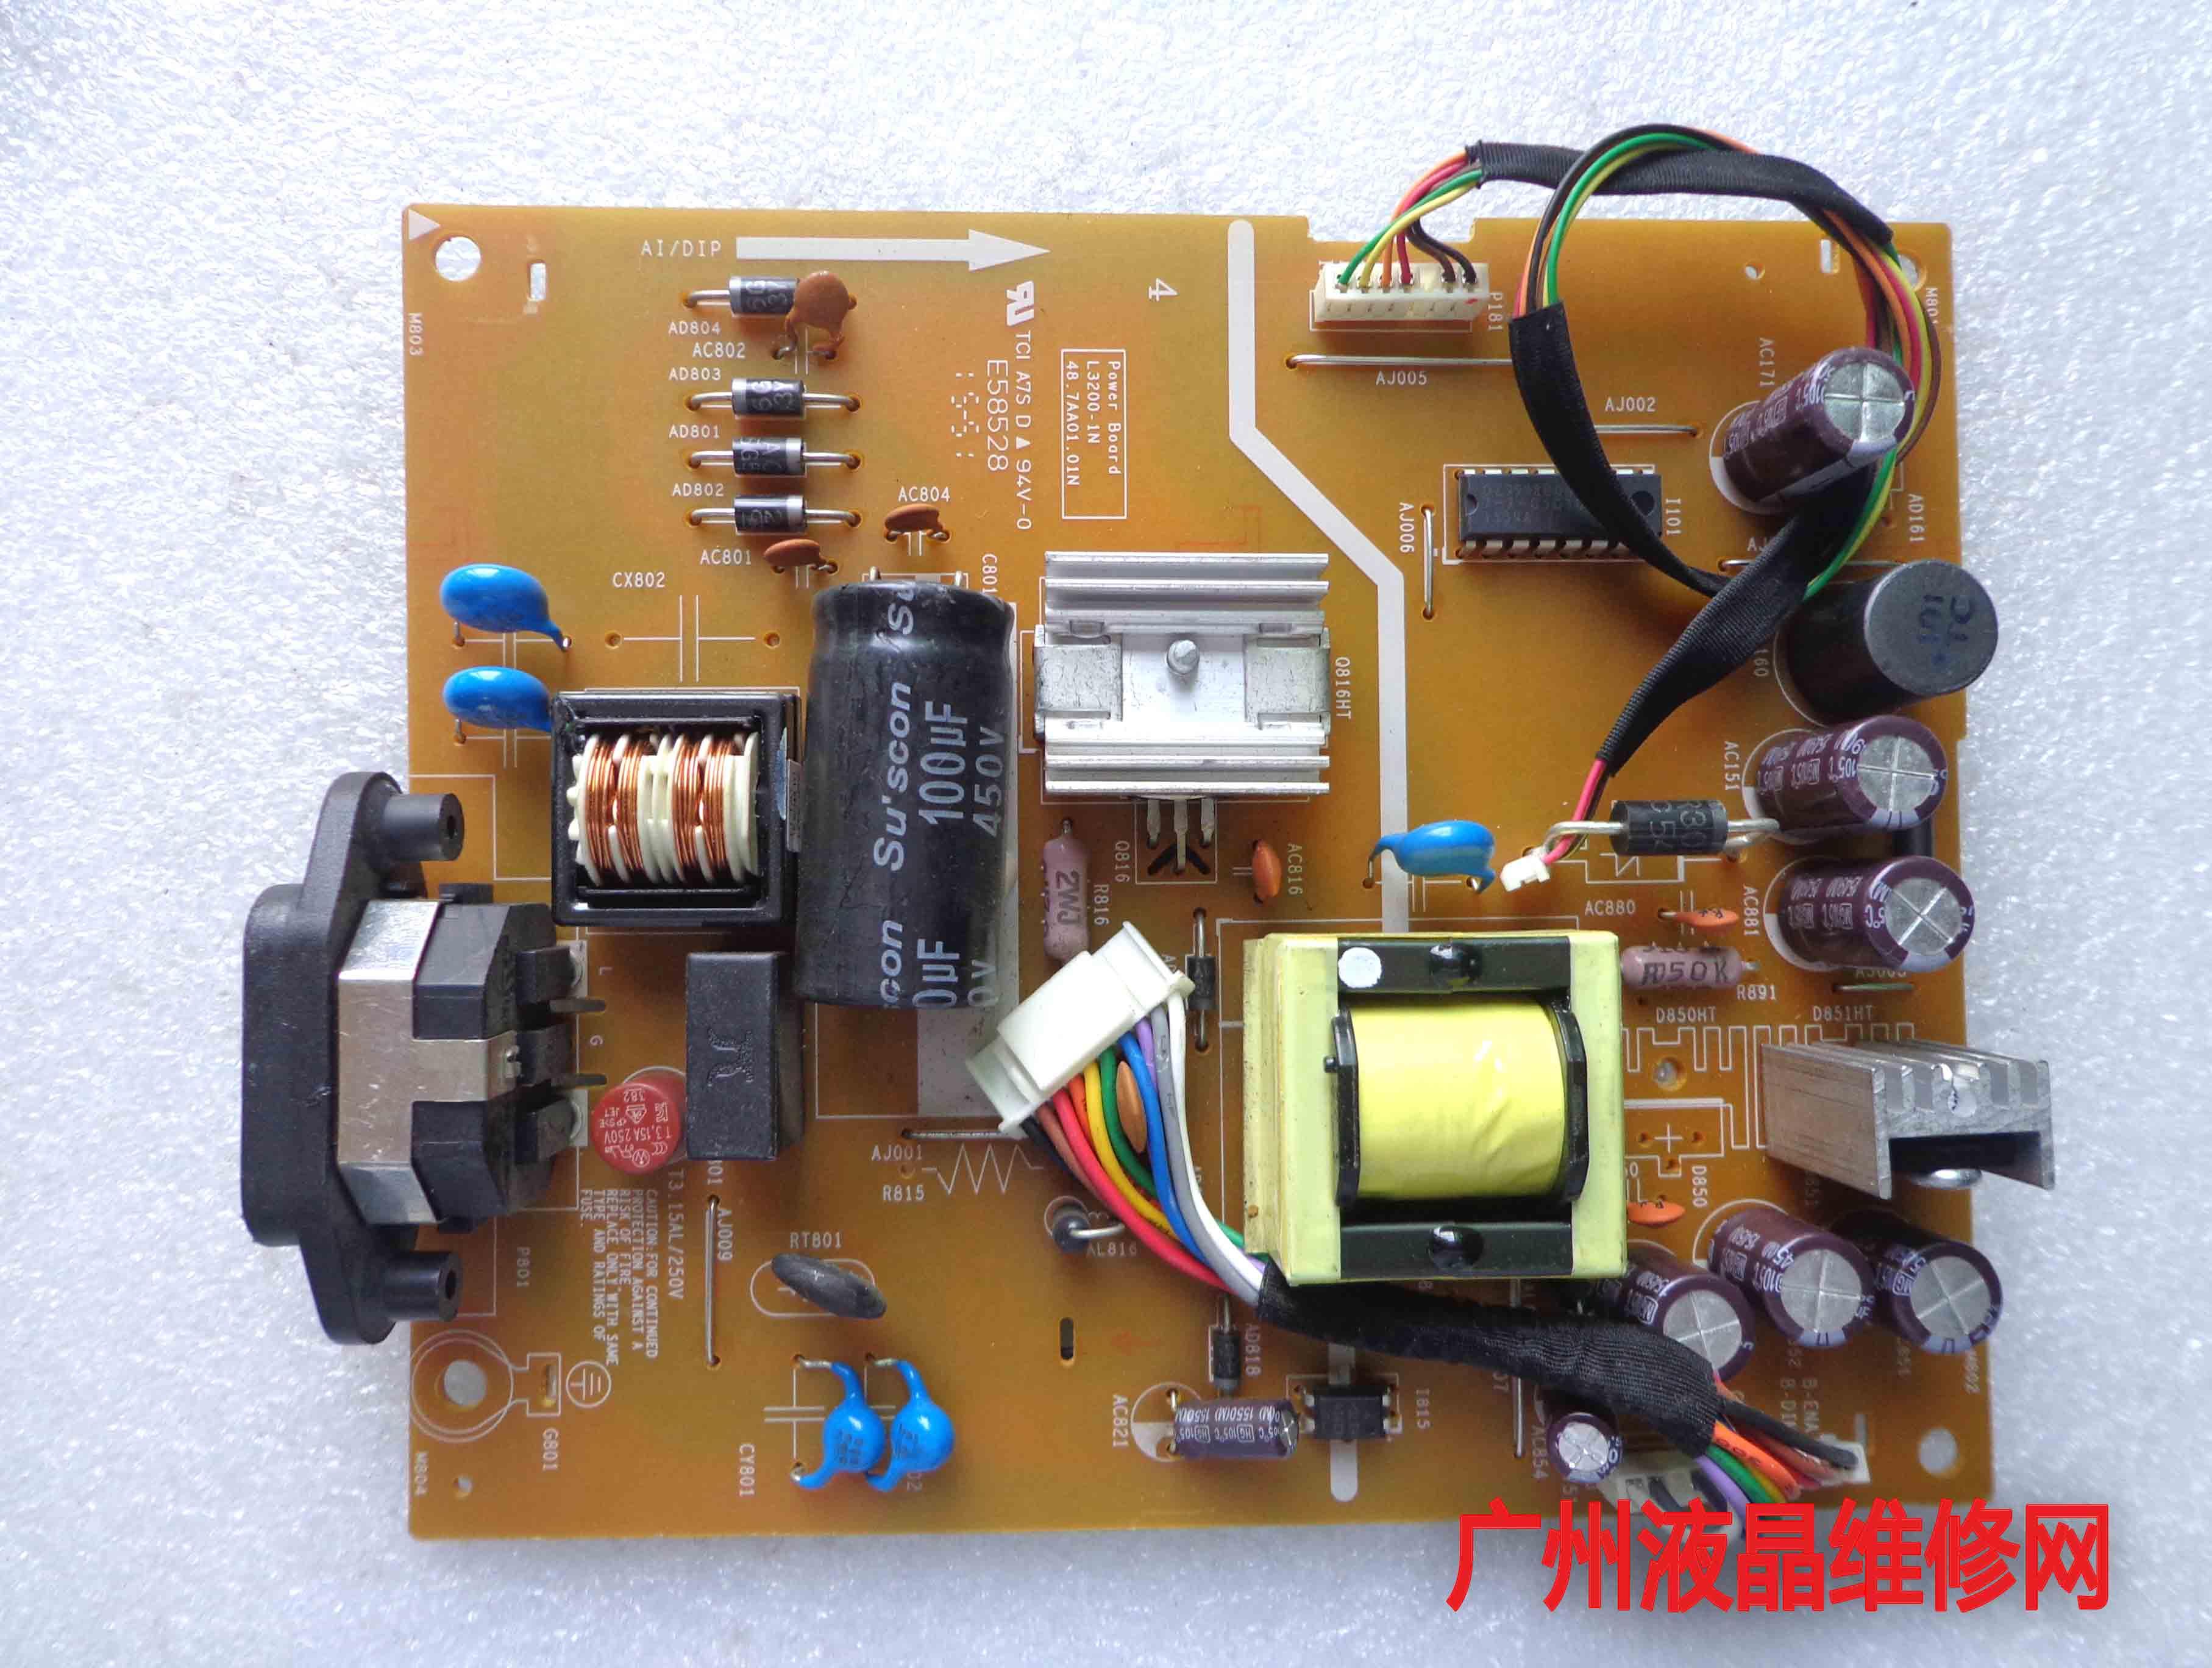 P2314HT original power supply board L3200-1N 48.7AA01.01M P2314HT